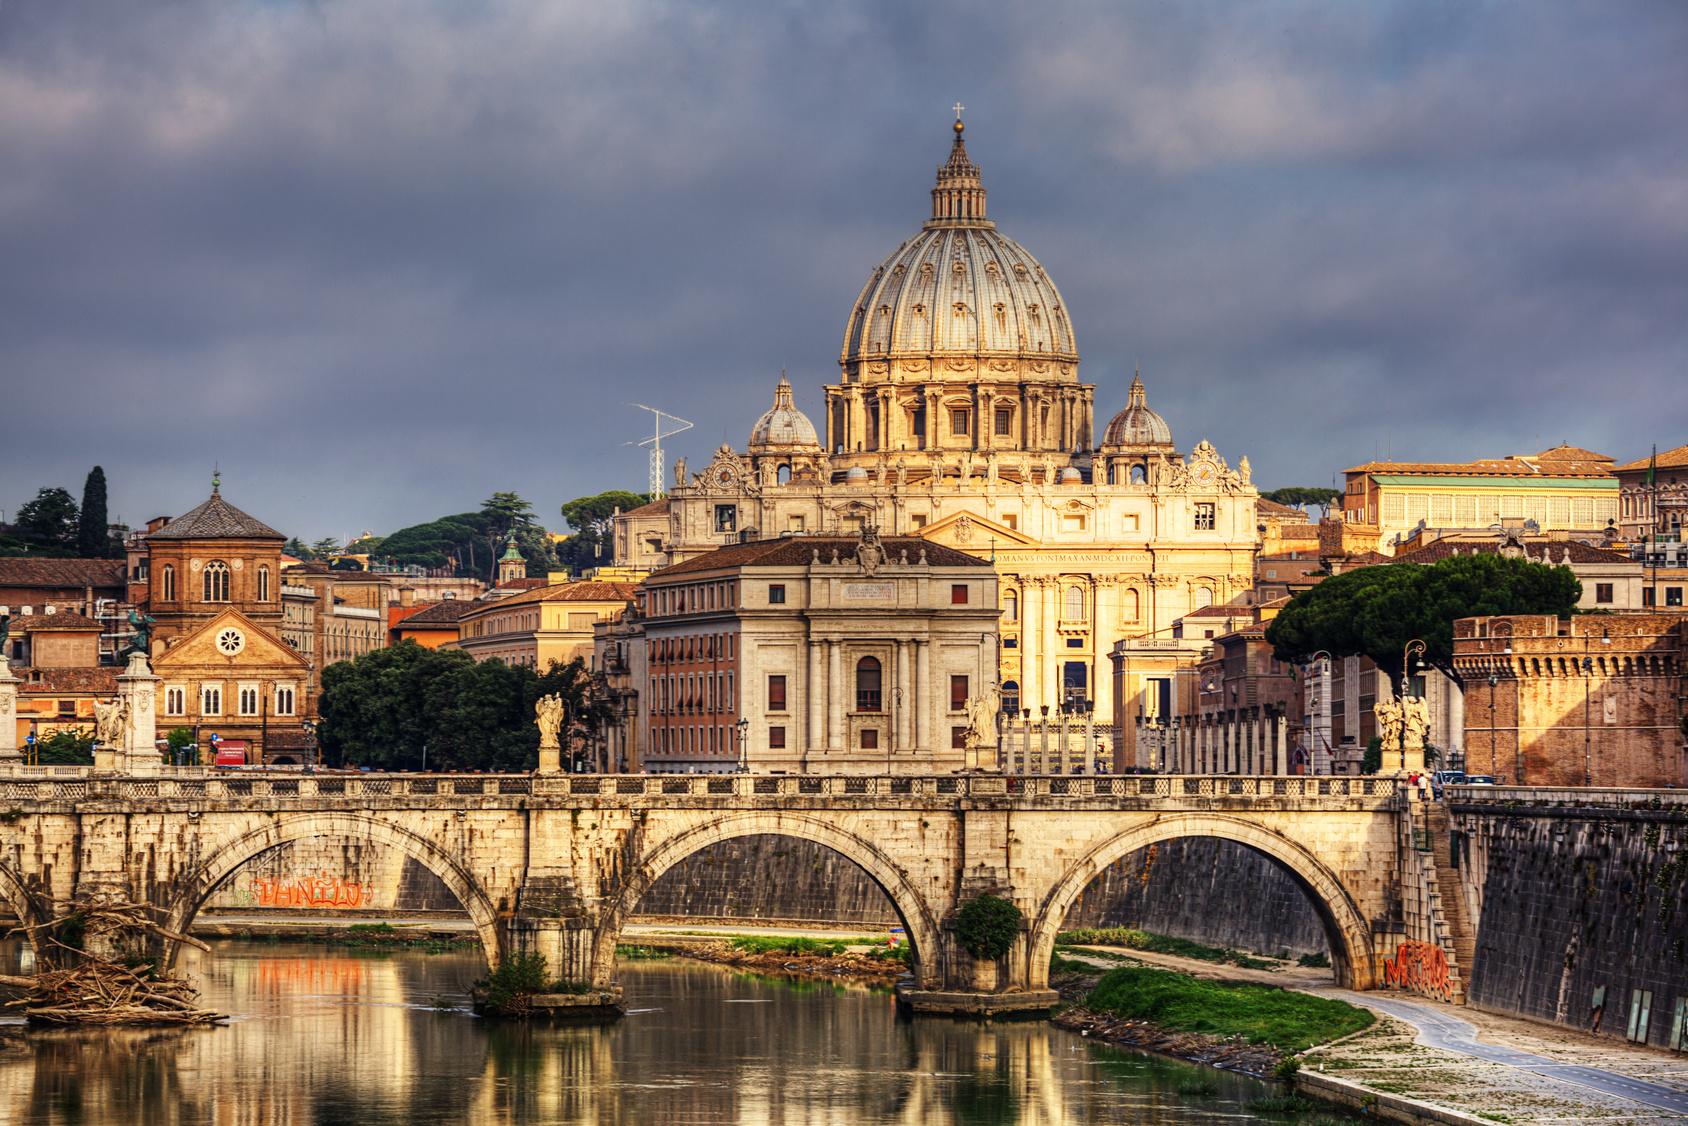 http://viajesalamedida.es/wp-content/uploads/2012/09/FOTO-BANNER-ROMA.jpg